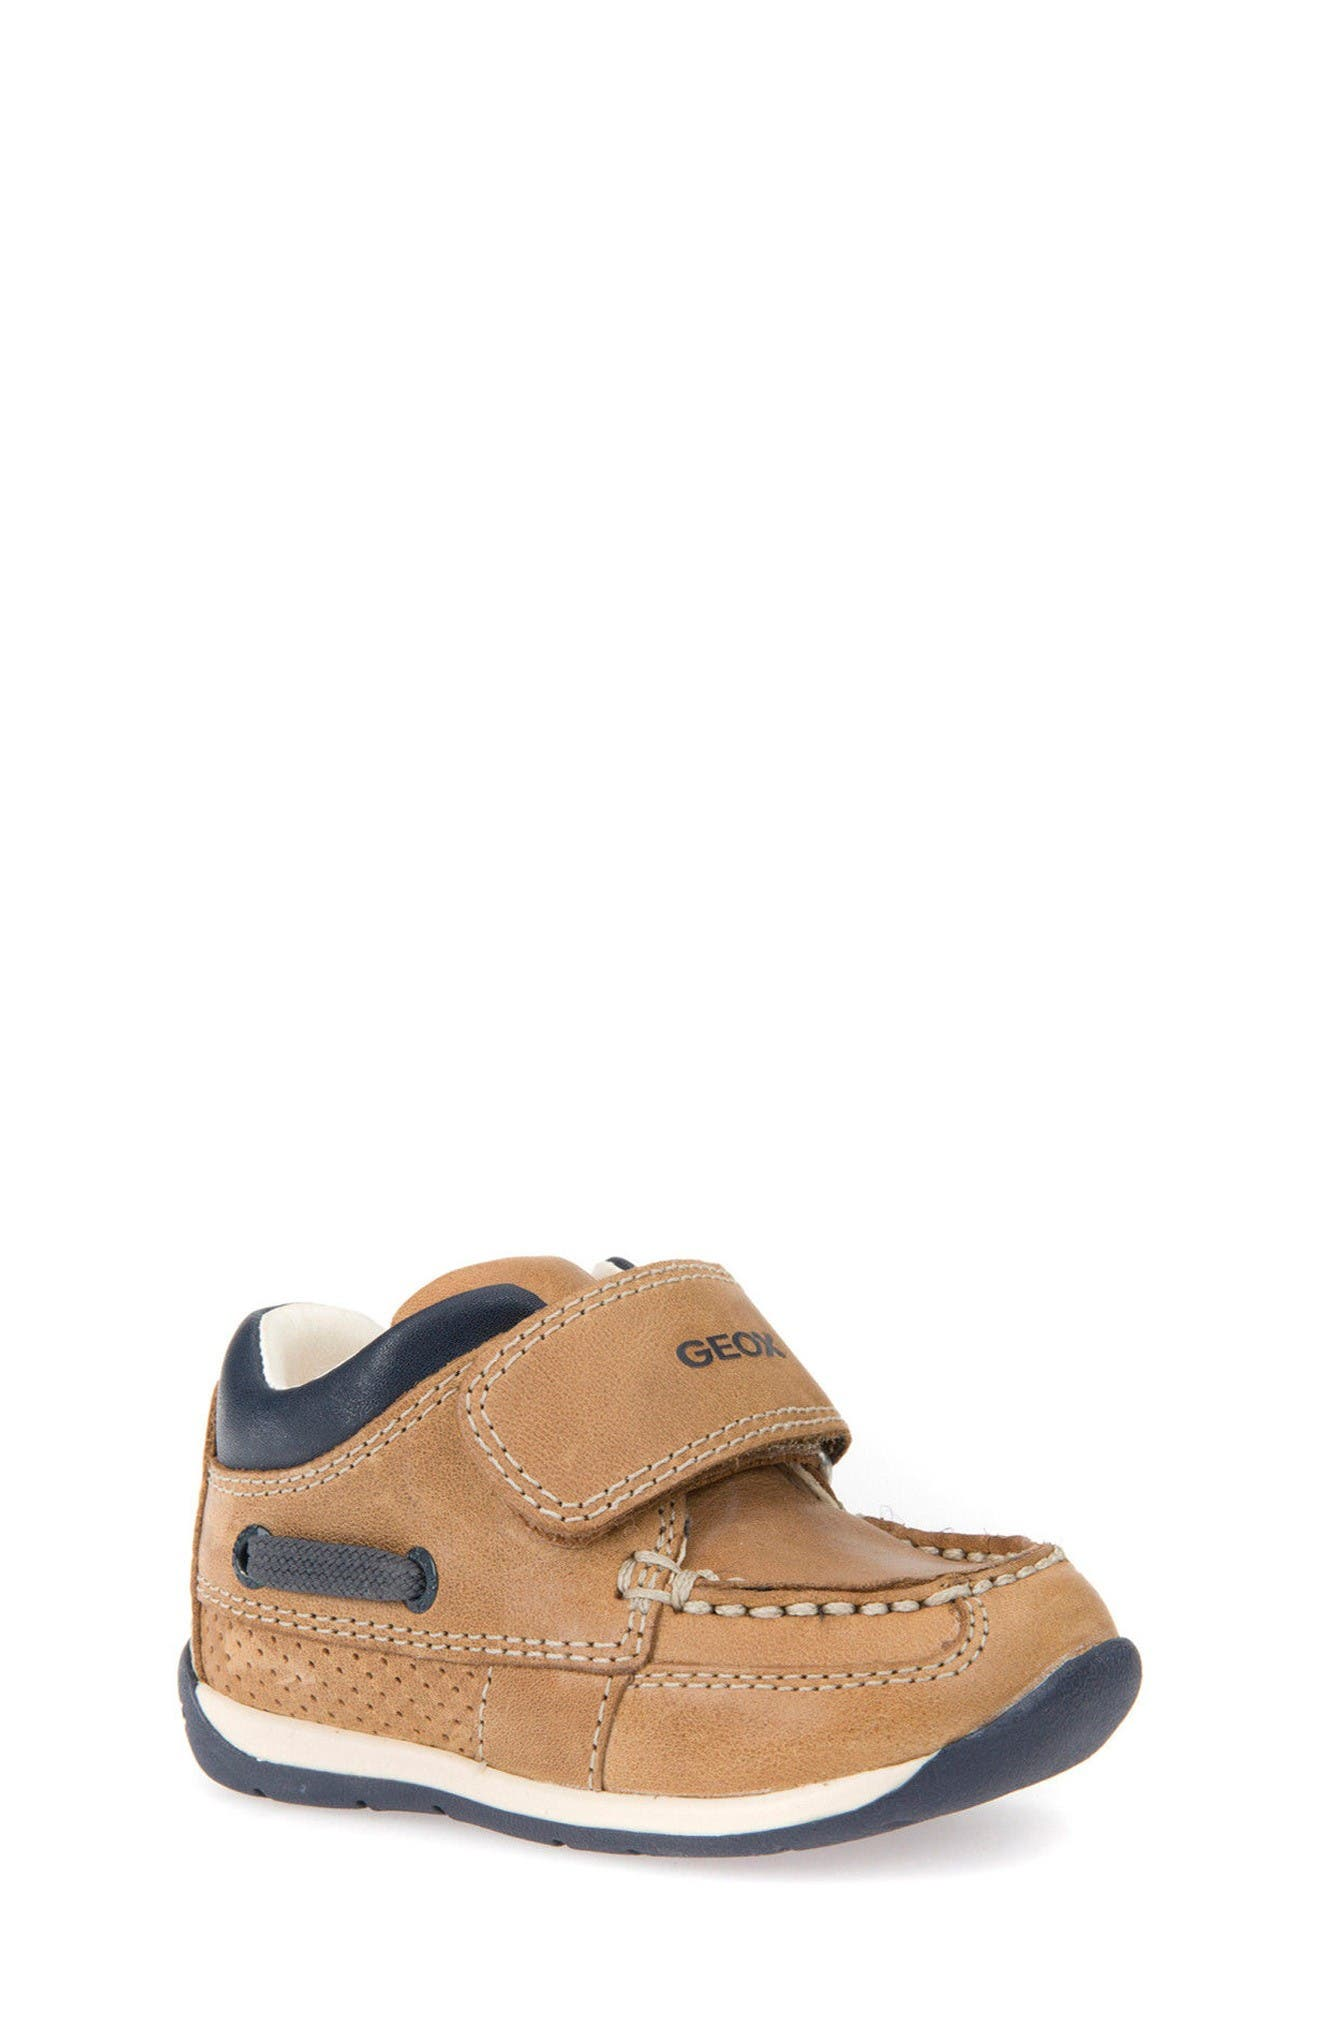 Geox Beach Sneaker (Baby, Walker & Toddler)